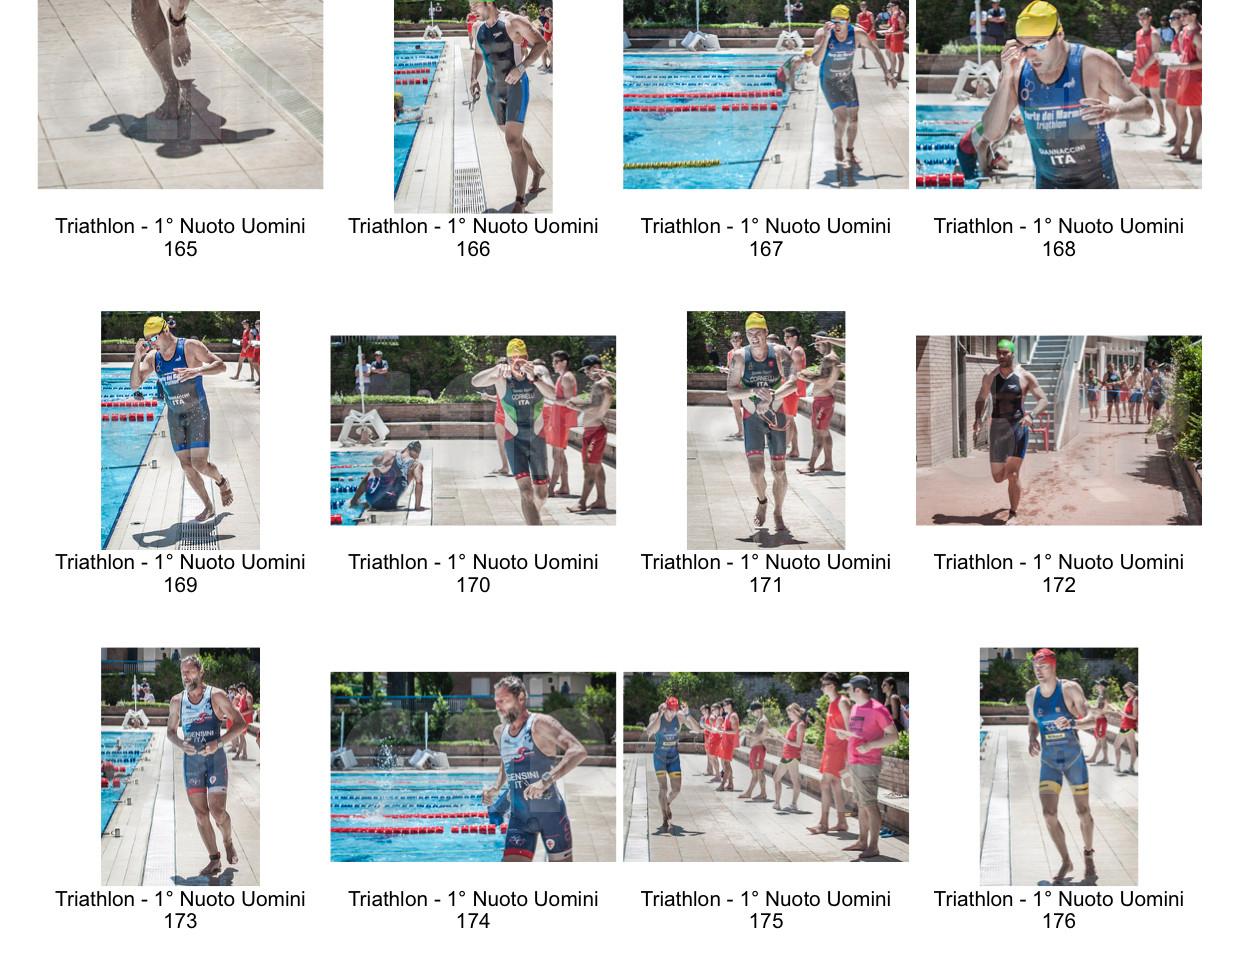 Triathlon_V.Elsa_-_1°_Frazione_Nuoto_Uomini_-09.jpg